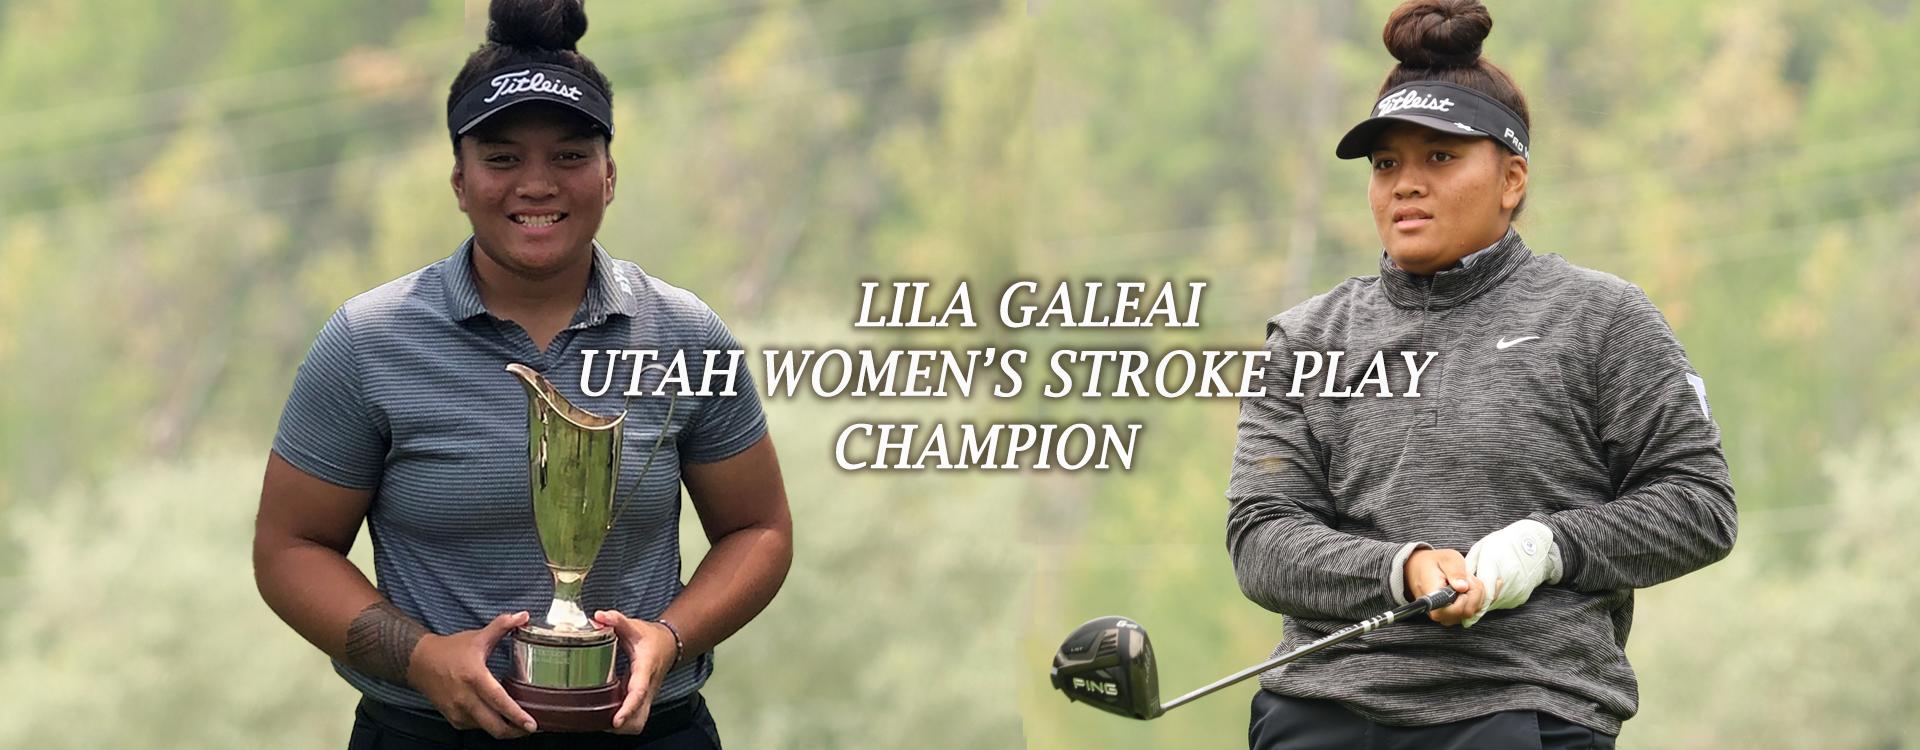 womens-stroke-play-champion